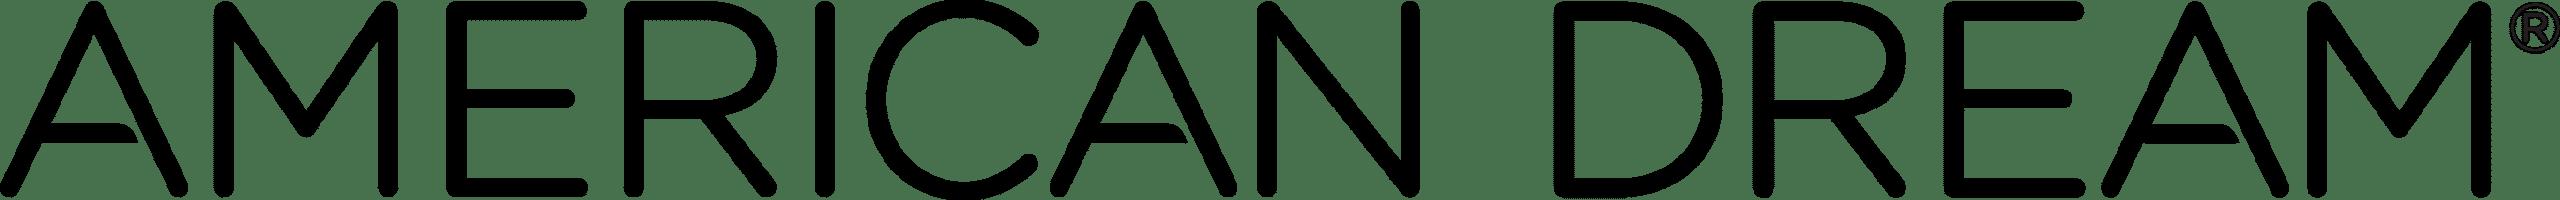 American Dream (logo)